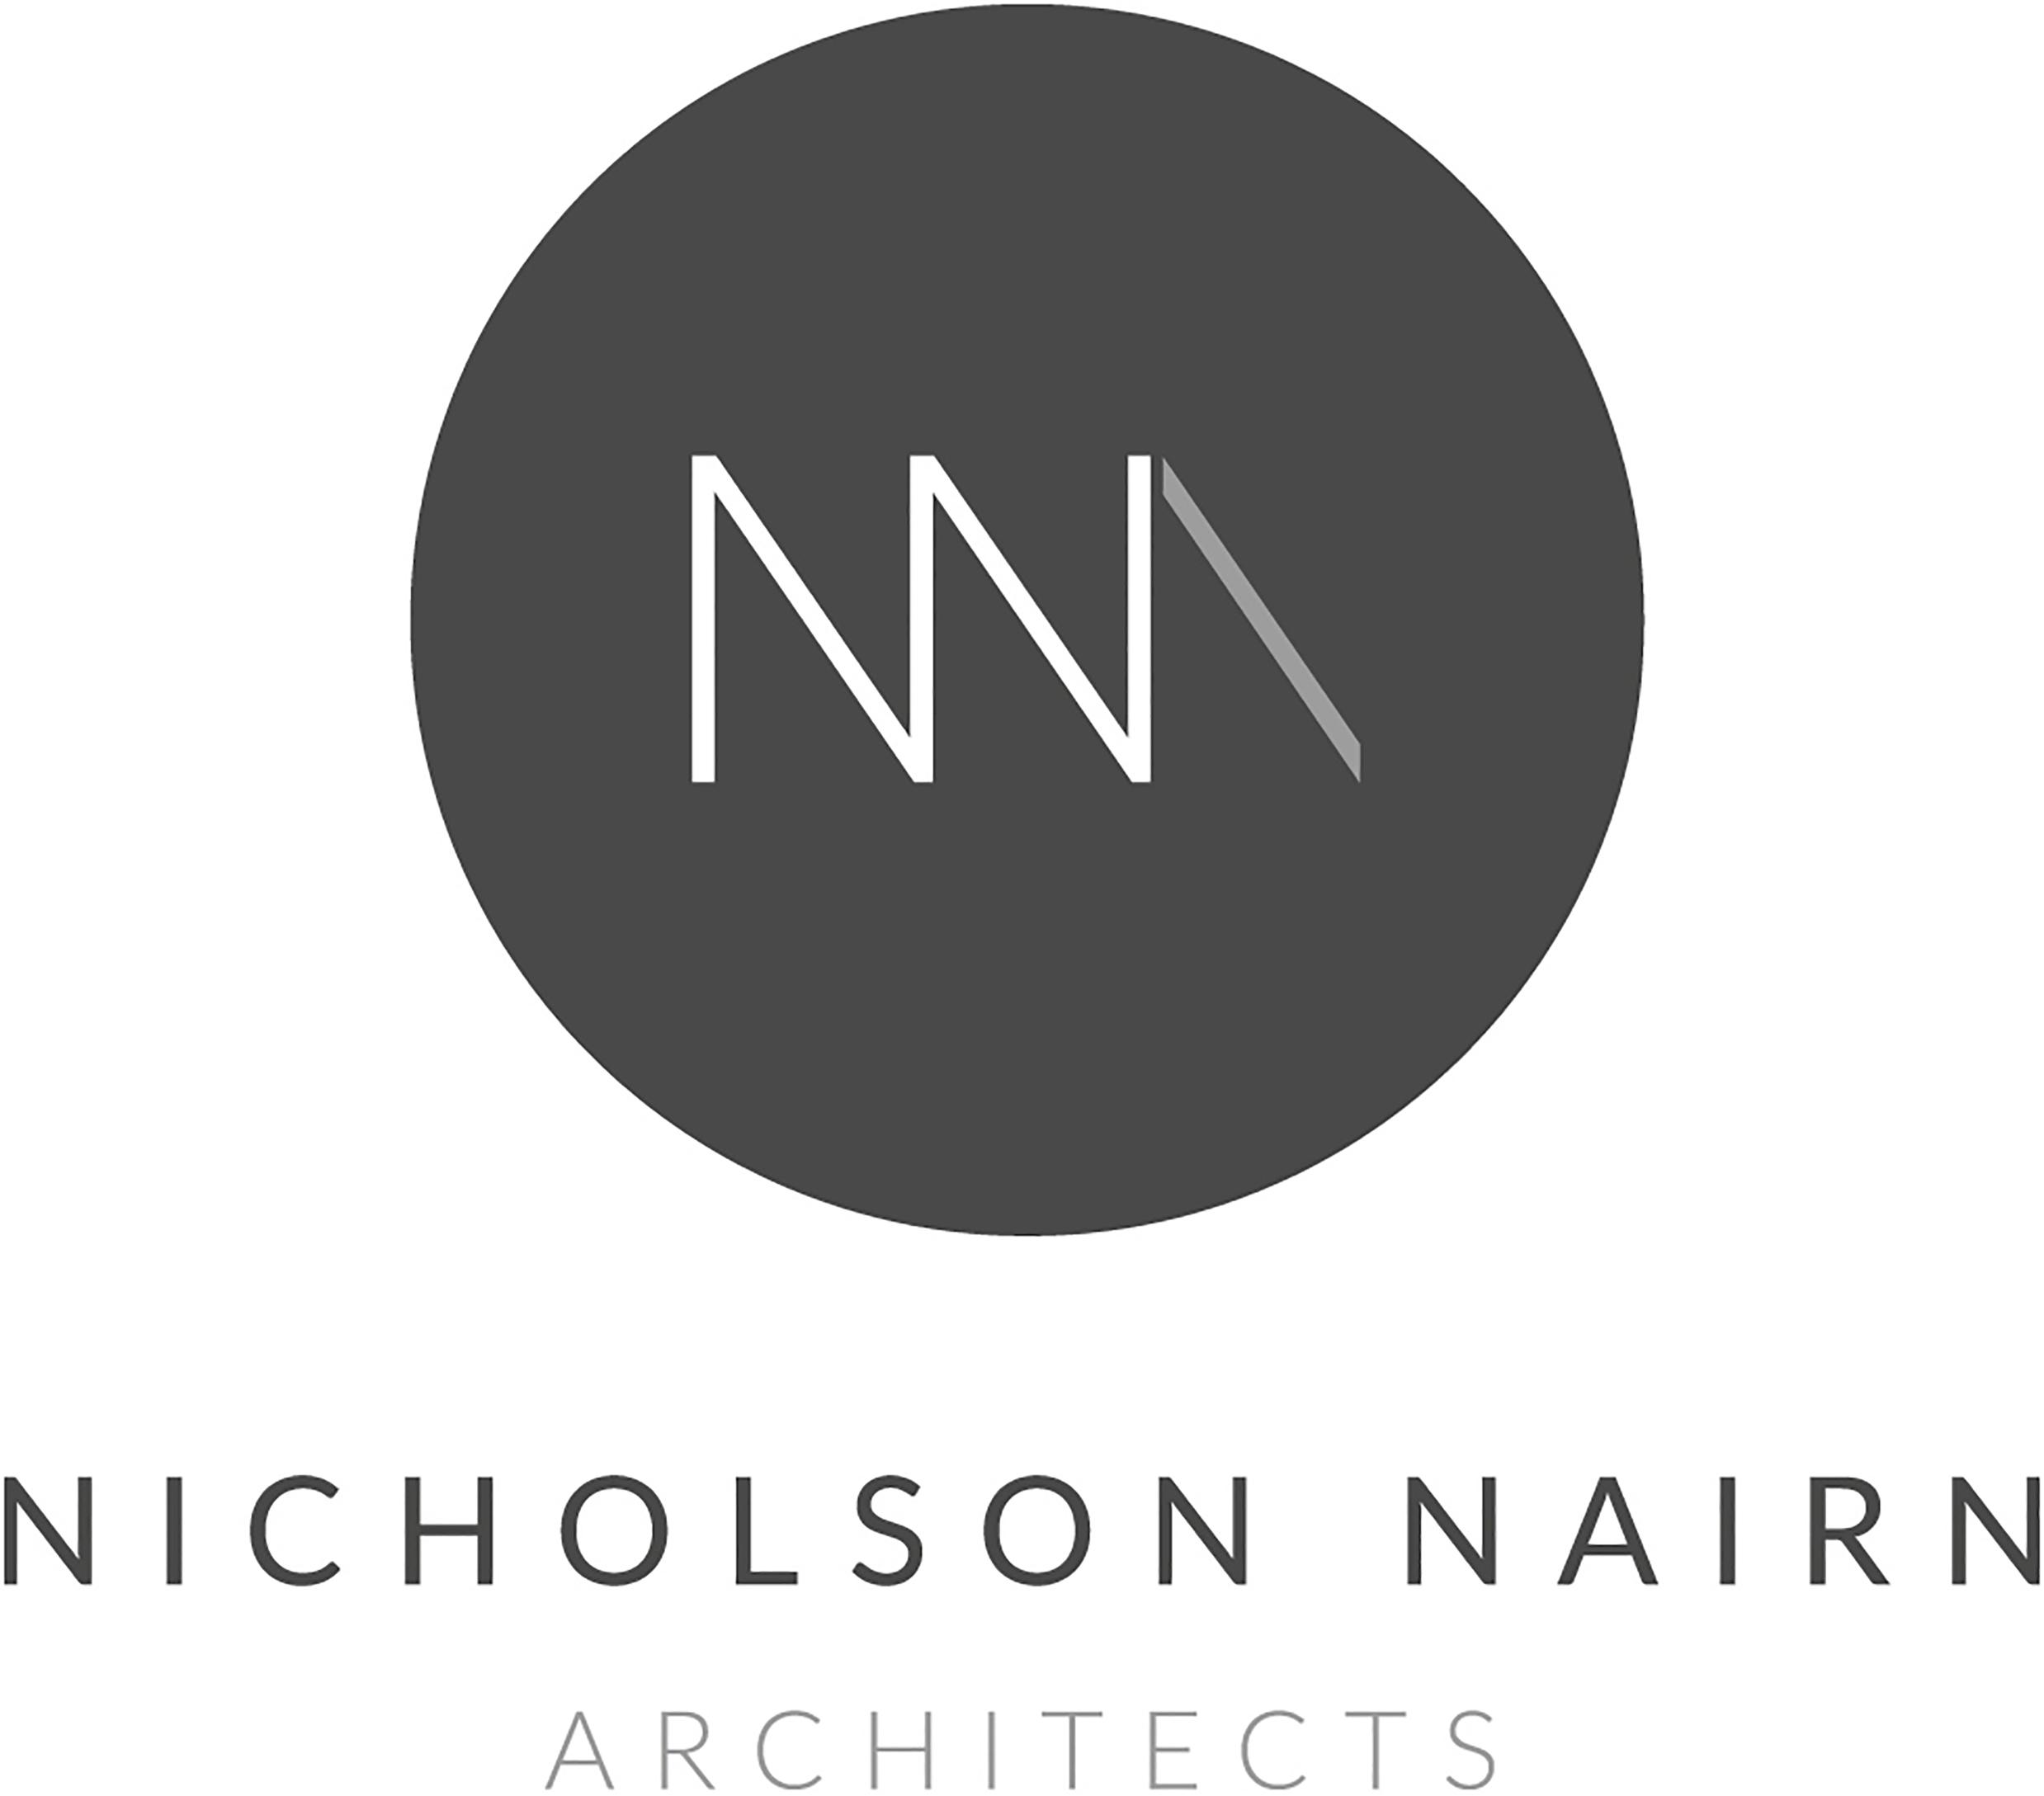 Nicholson Nairn Architects